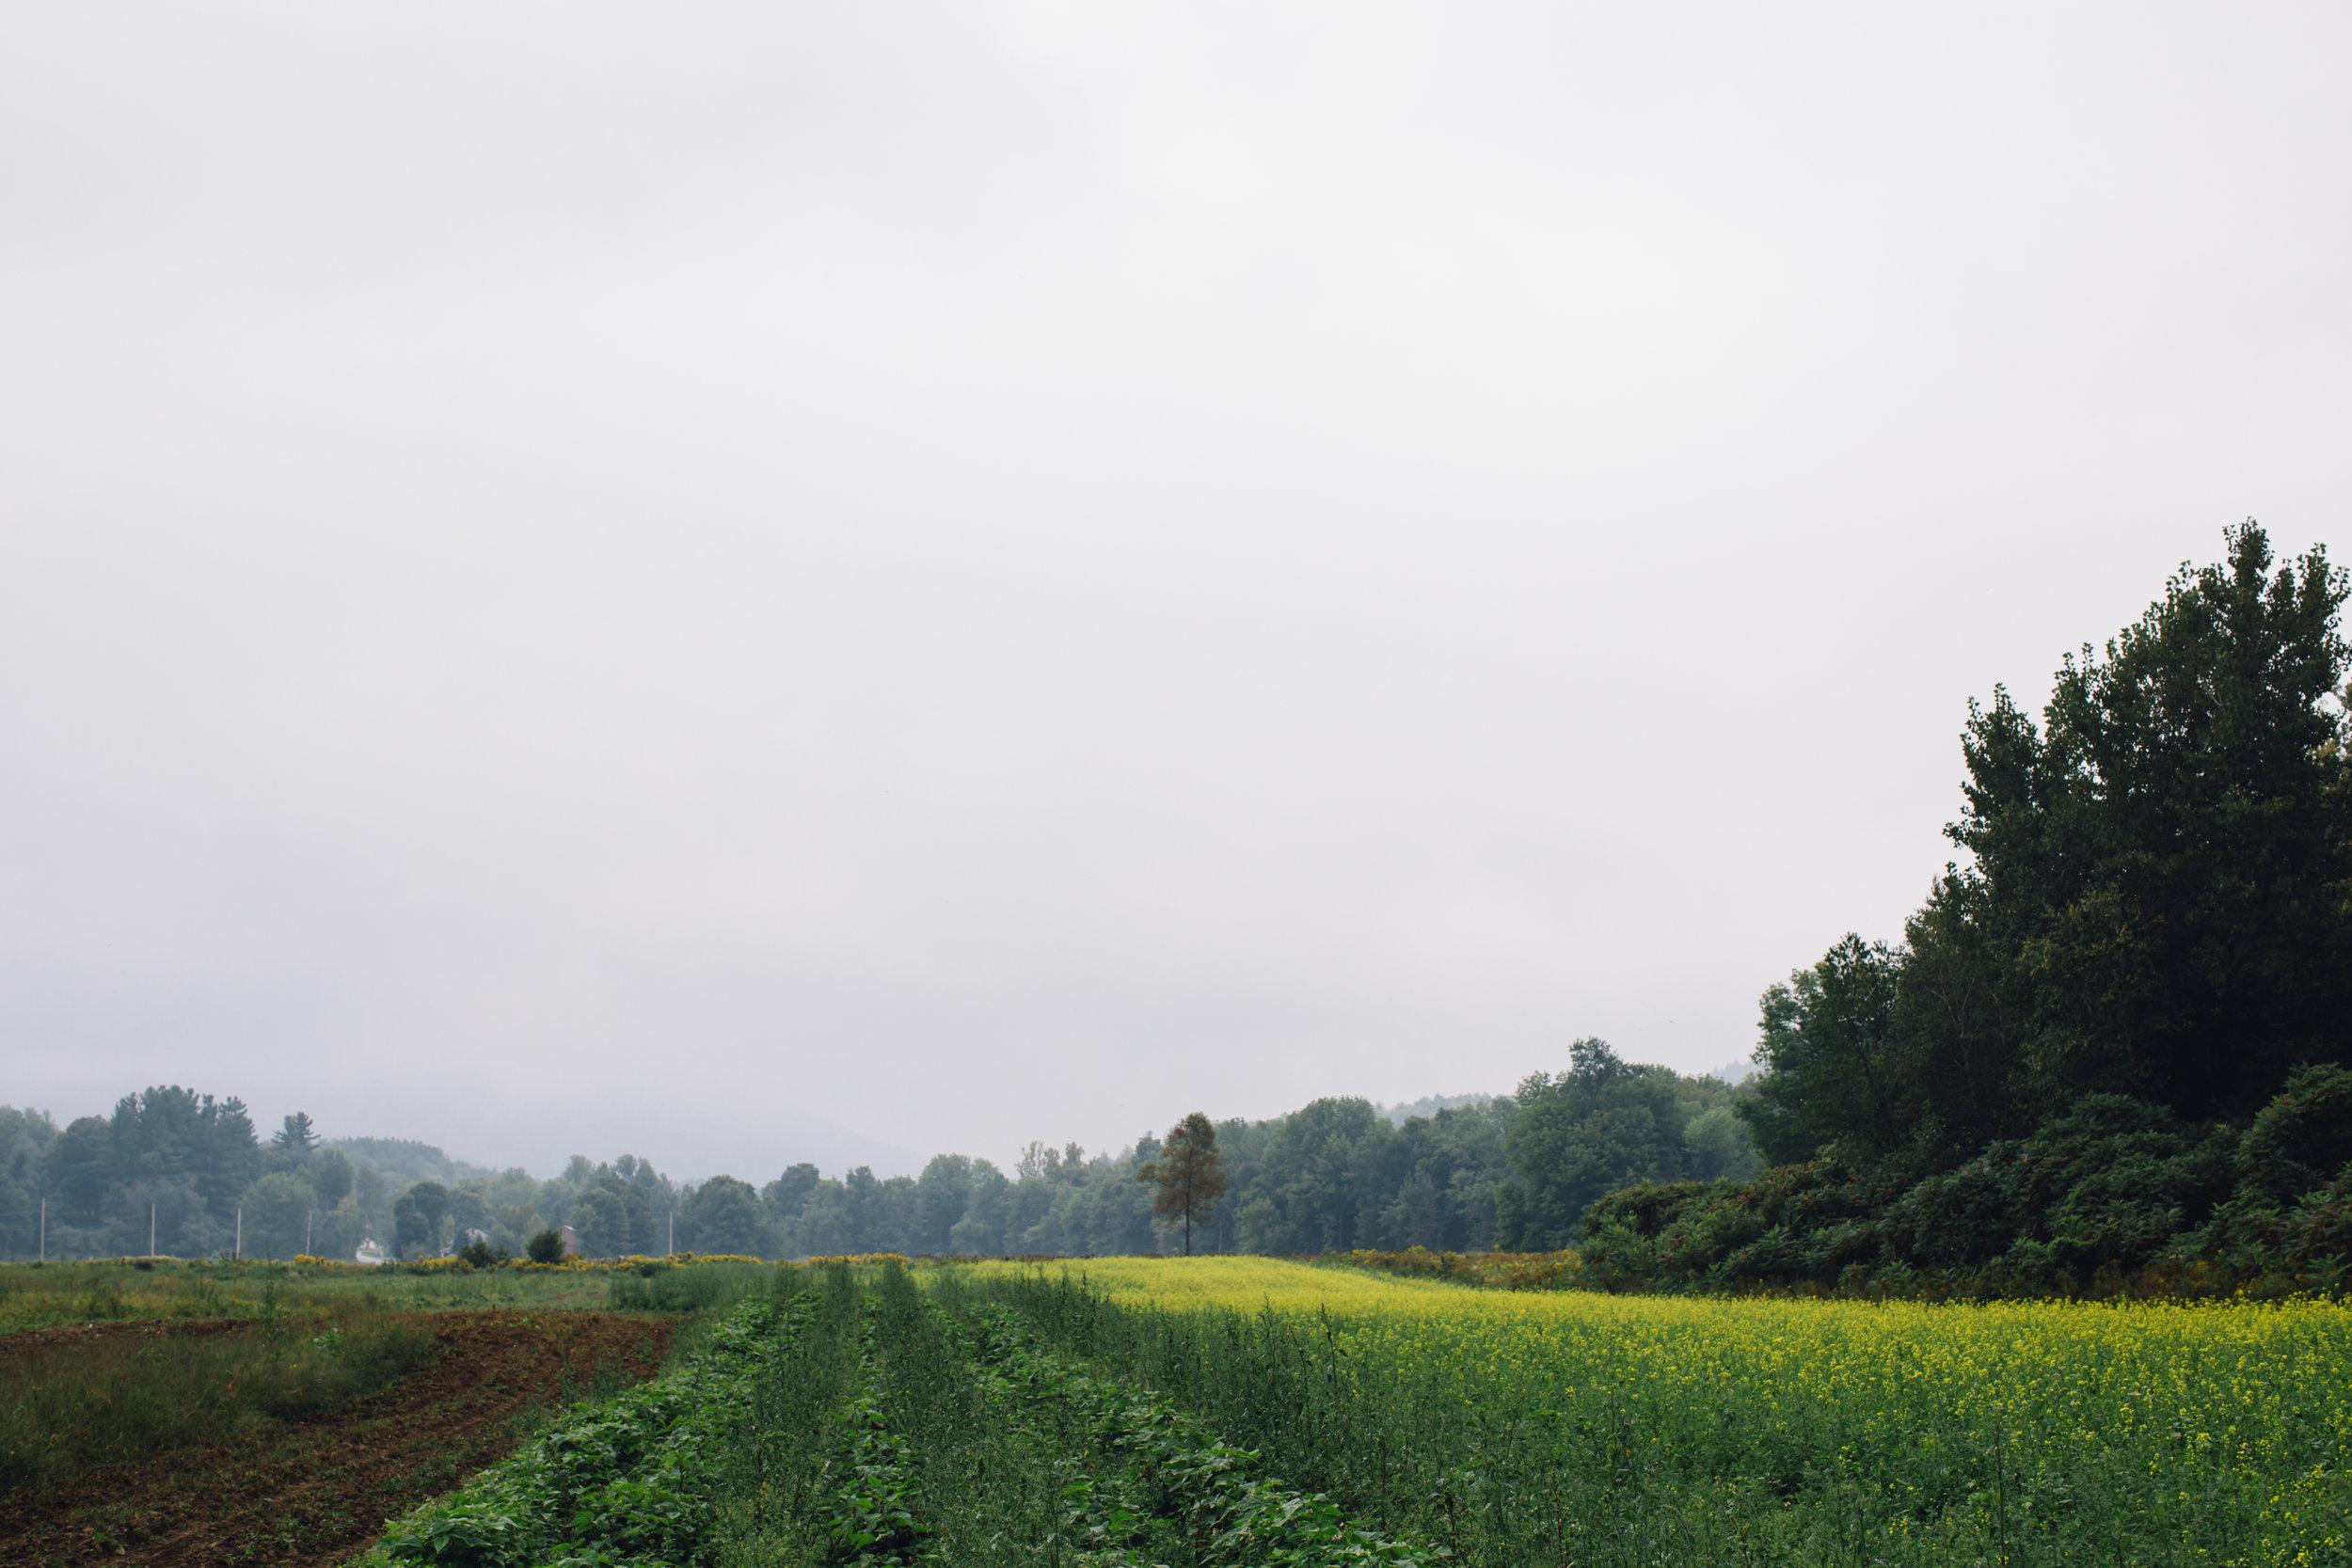 Fields at Valley Dream Farm